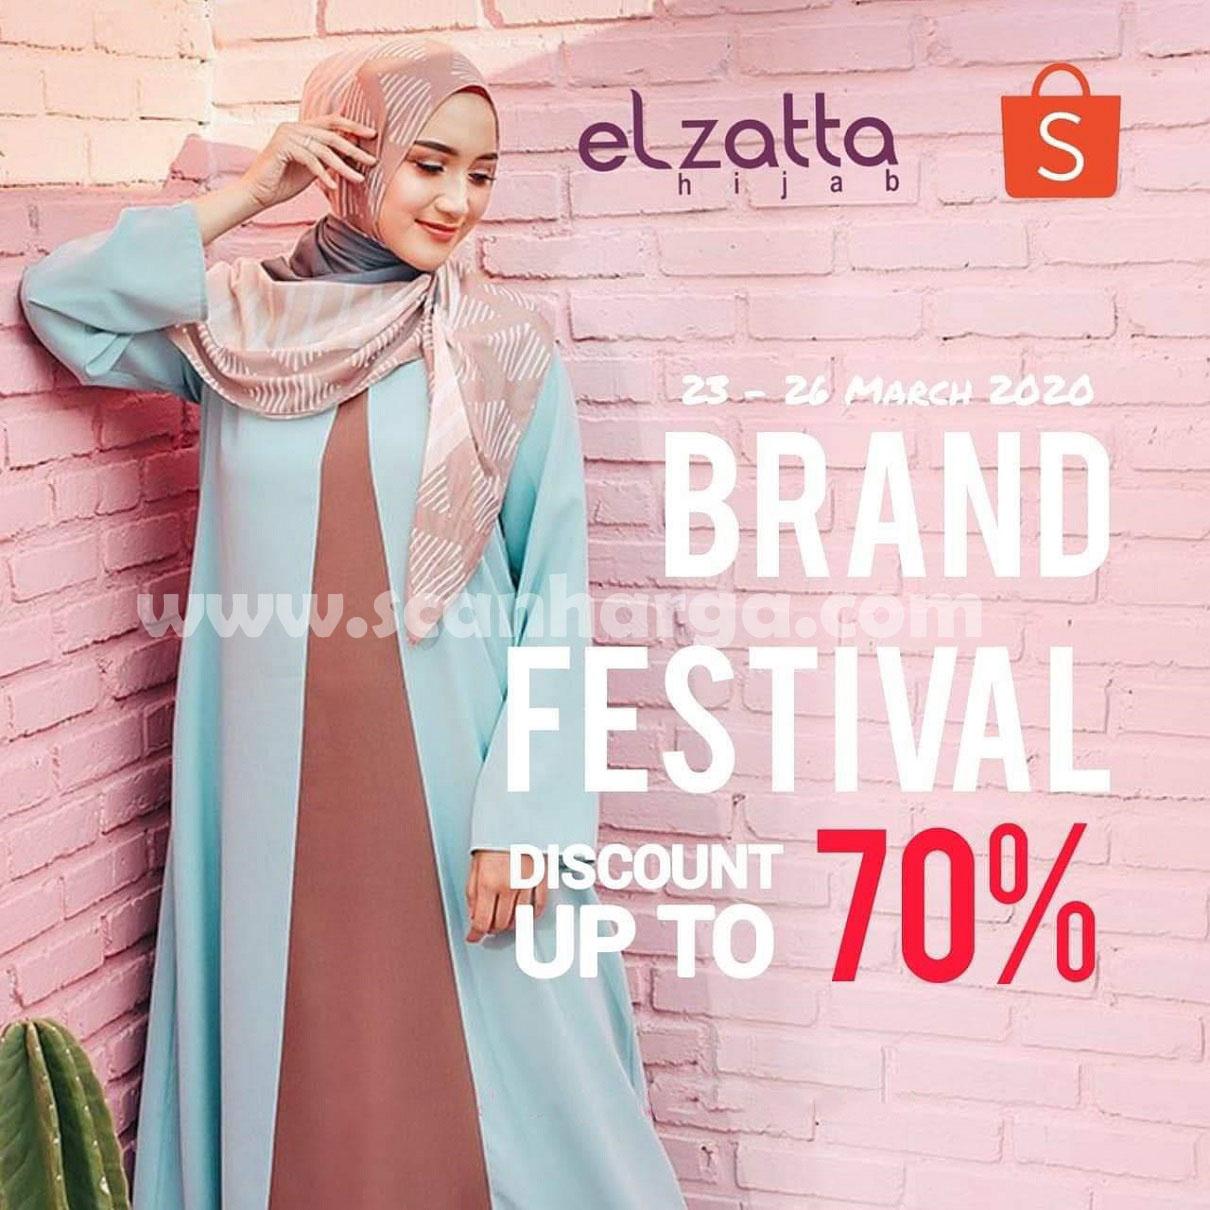 Promo Elzatta Hijab Brand Festival di Shopee Diskon Hingga 70% Periode 23 - 26 Maret 2020